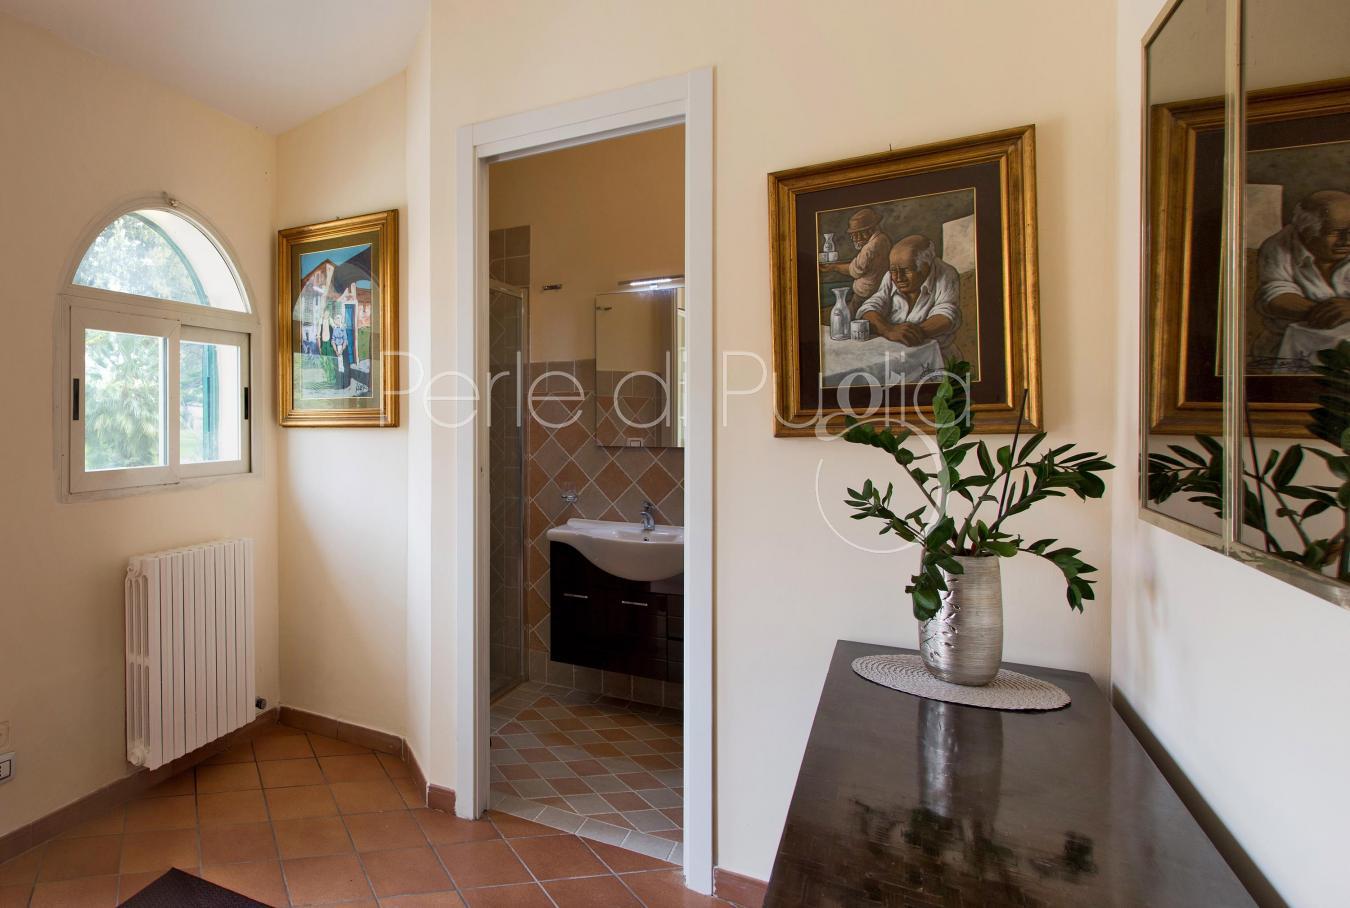 Arredo casa rauccio srl : arredo bagno classico on line. arredo ...